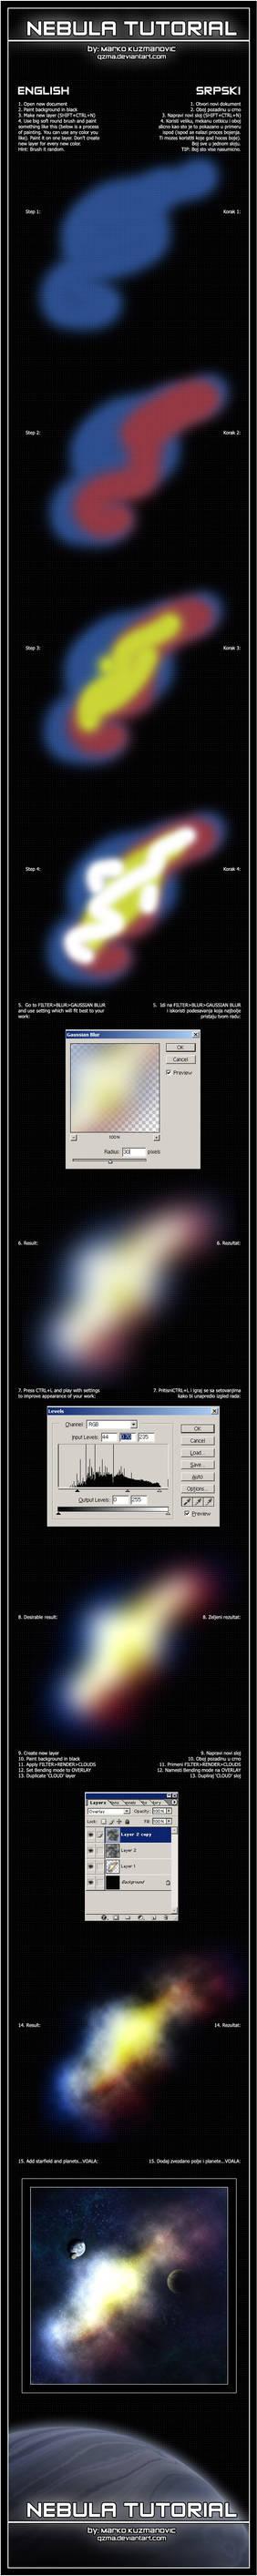 Nebula Tutorial by Qzma